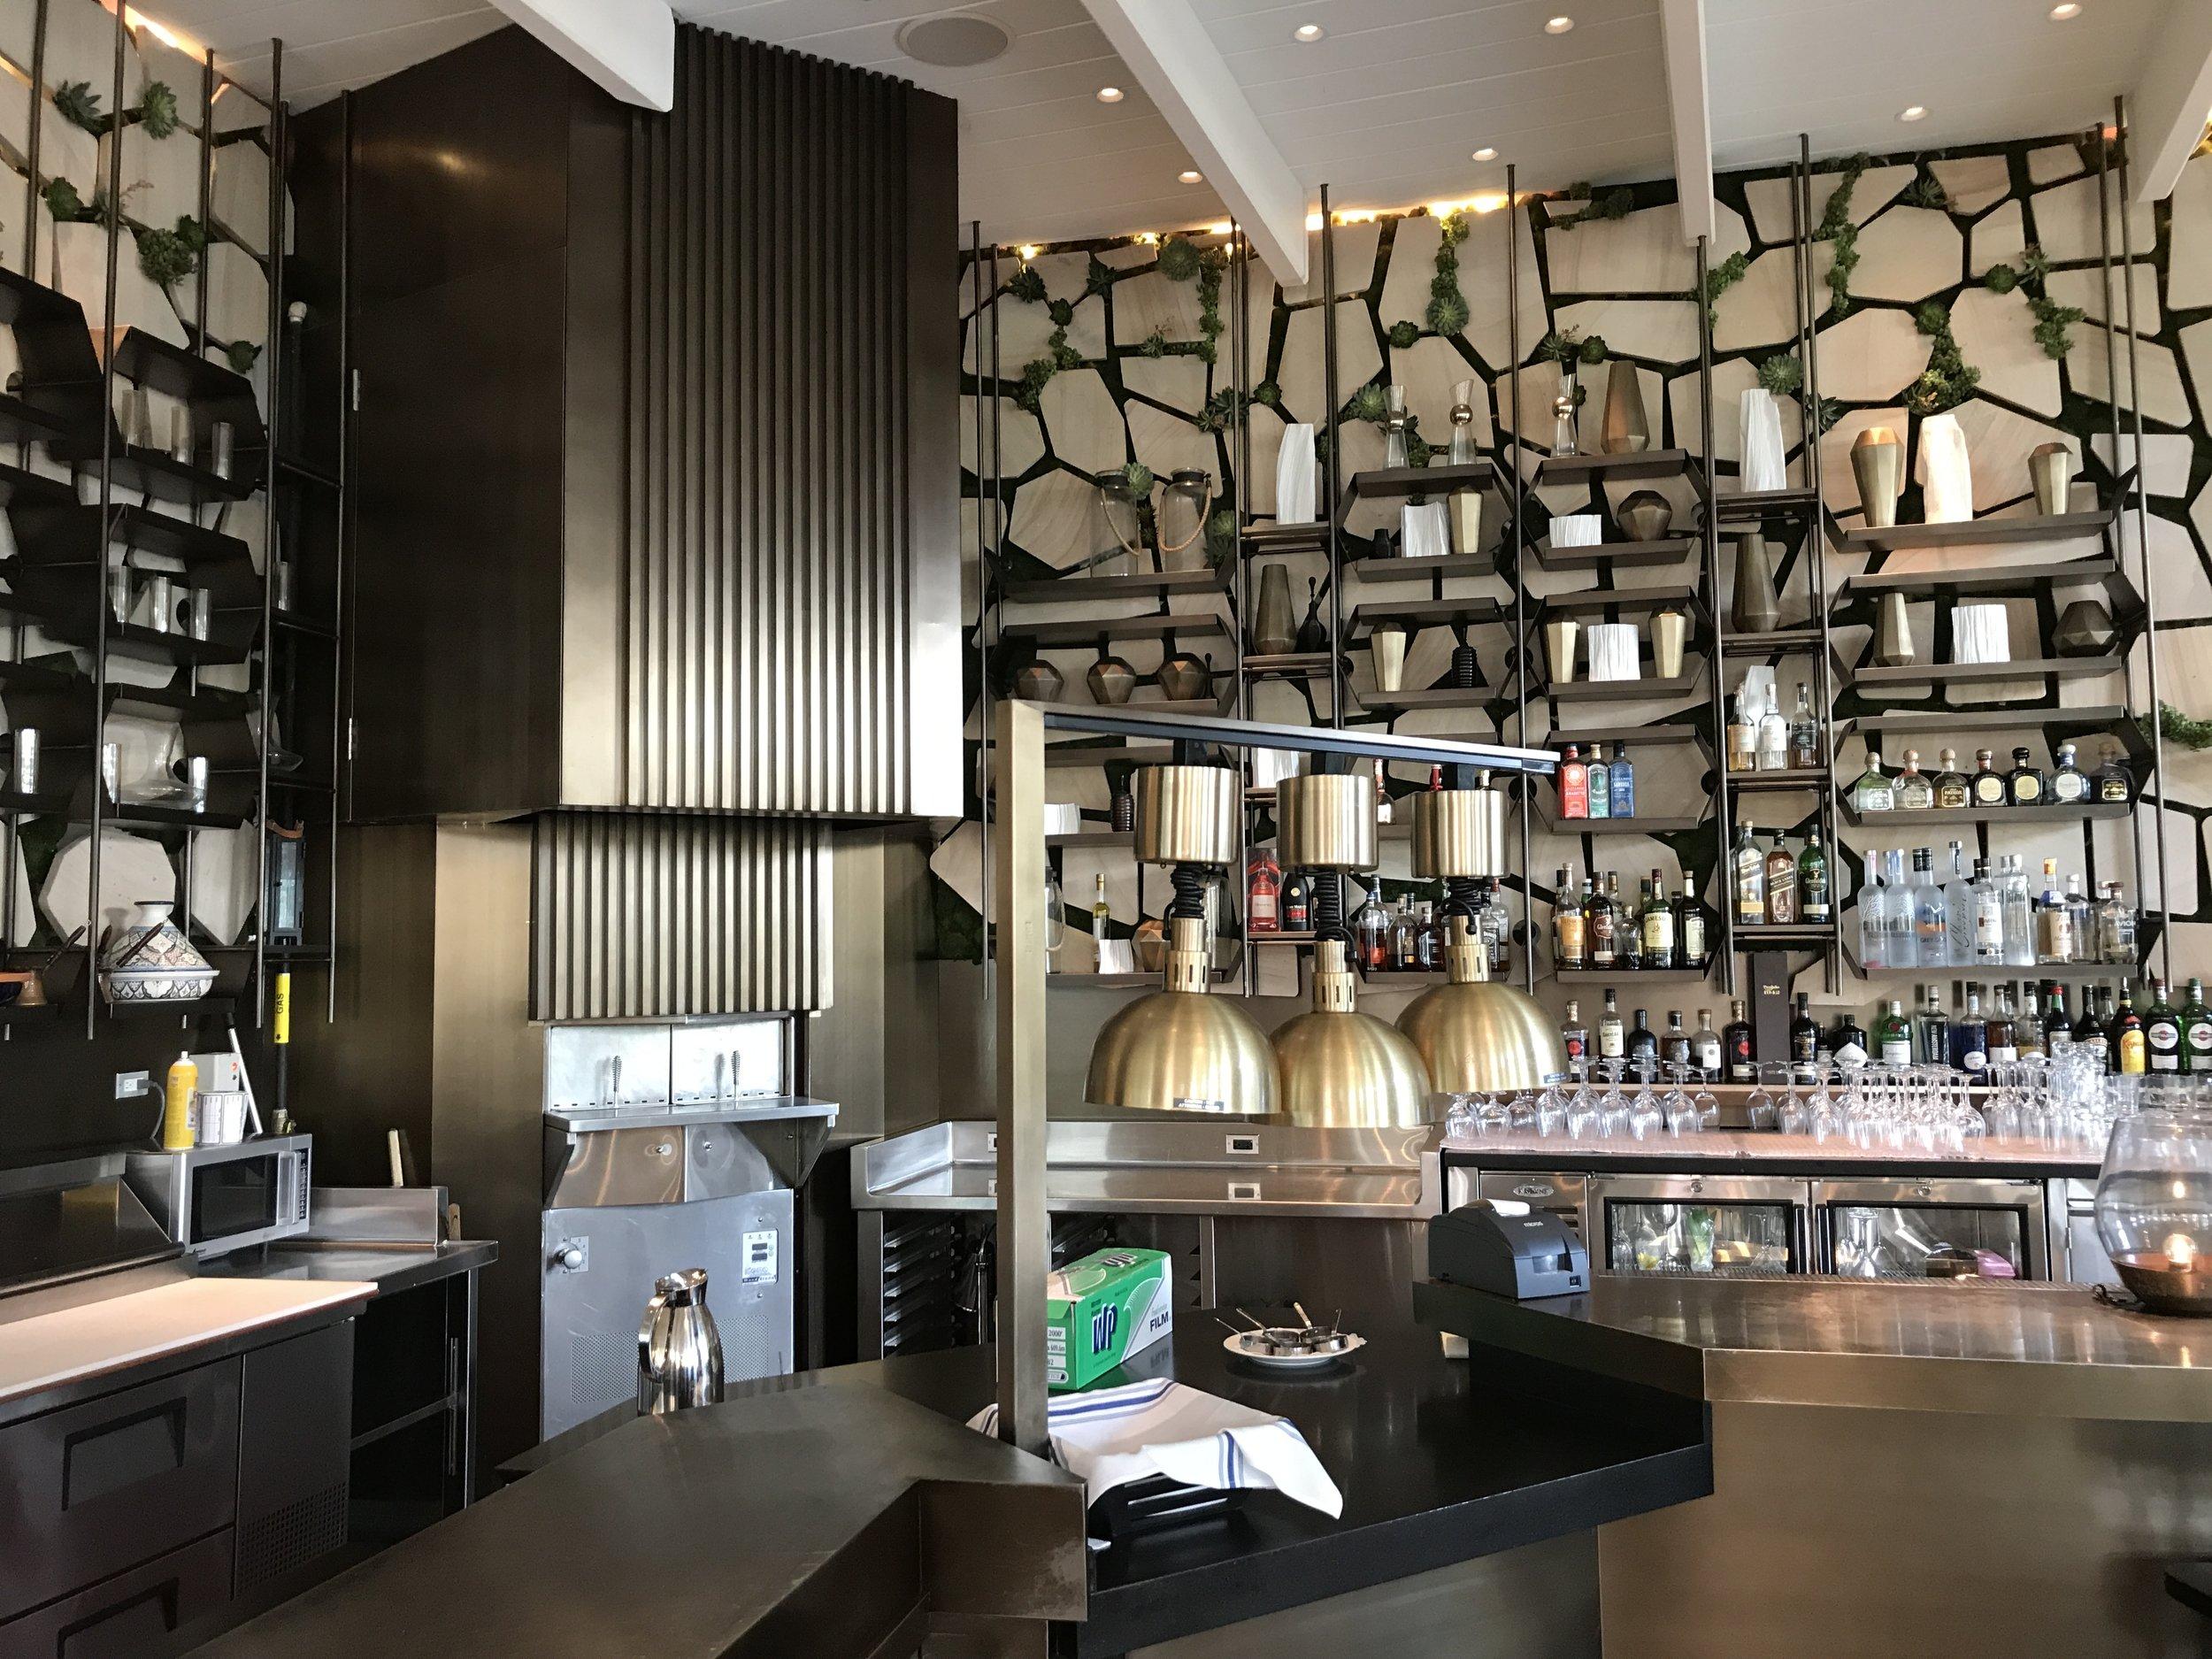 Cleo Restaurant_PDG_Tenant Improvement7.JPG